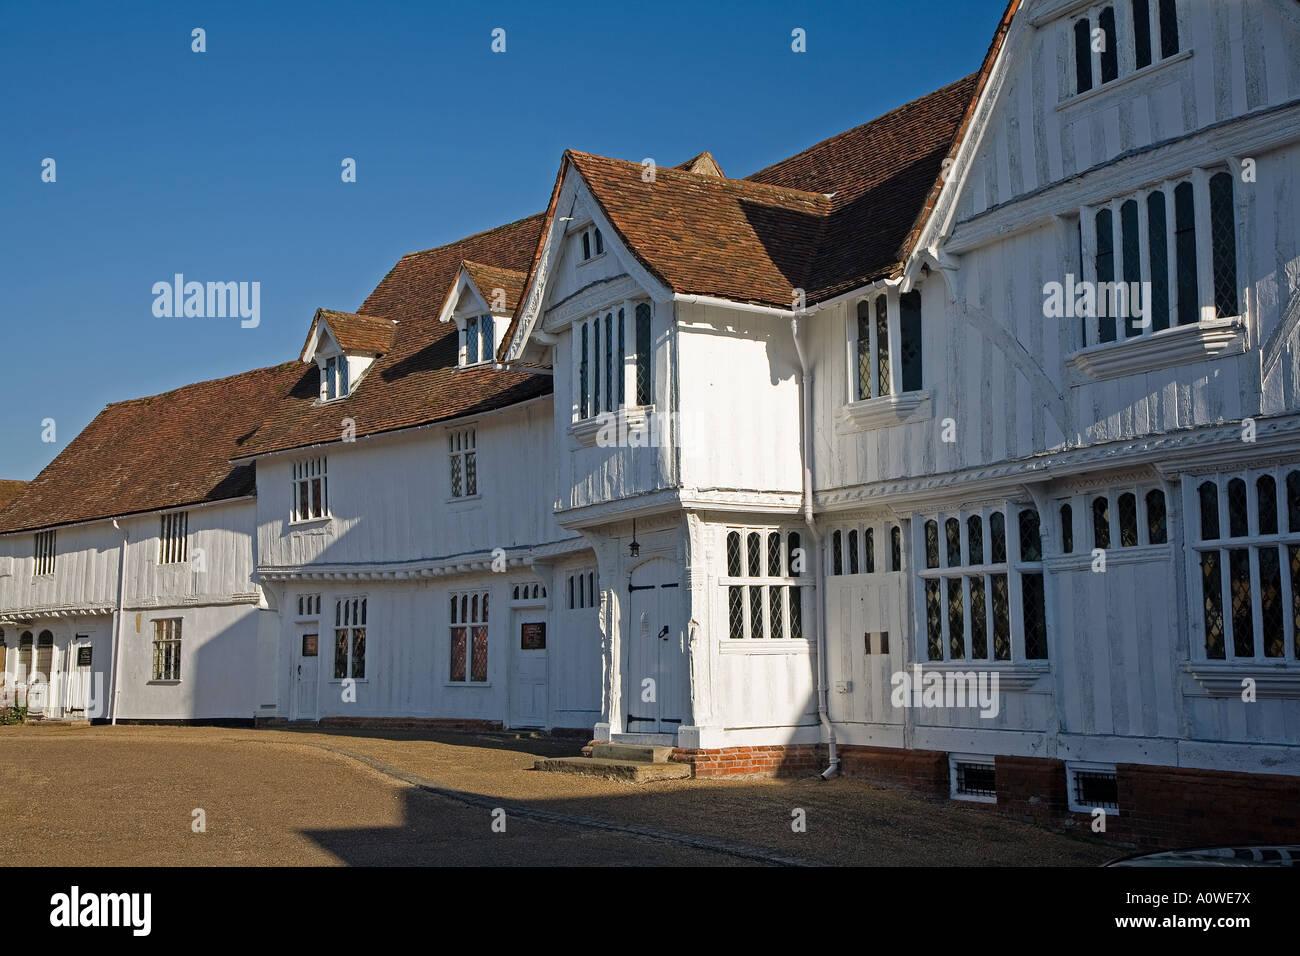 Guildhall, Lavenham, Suffolk. - Stock Image